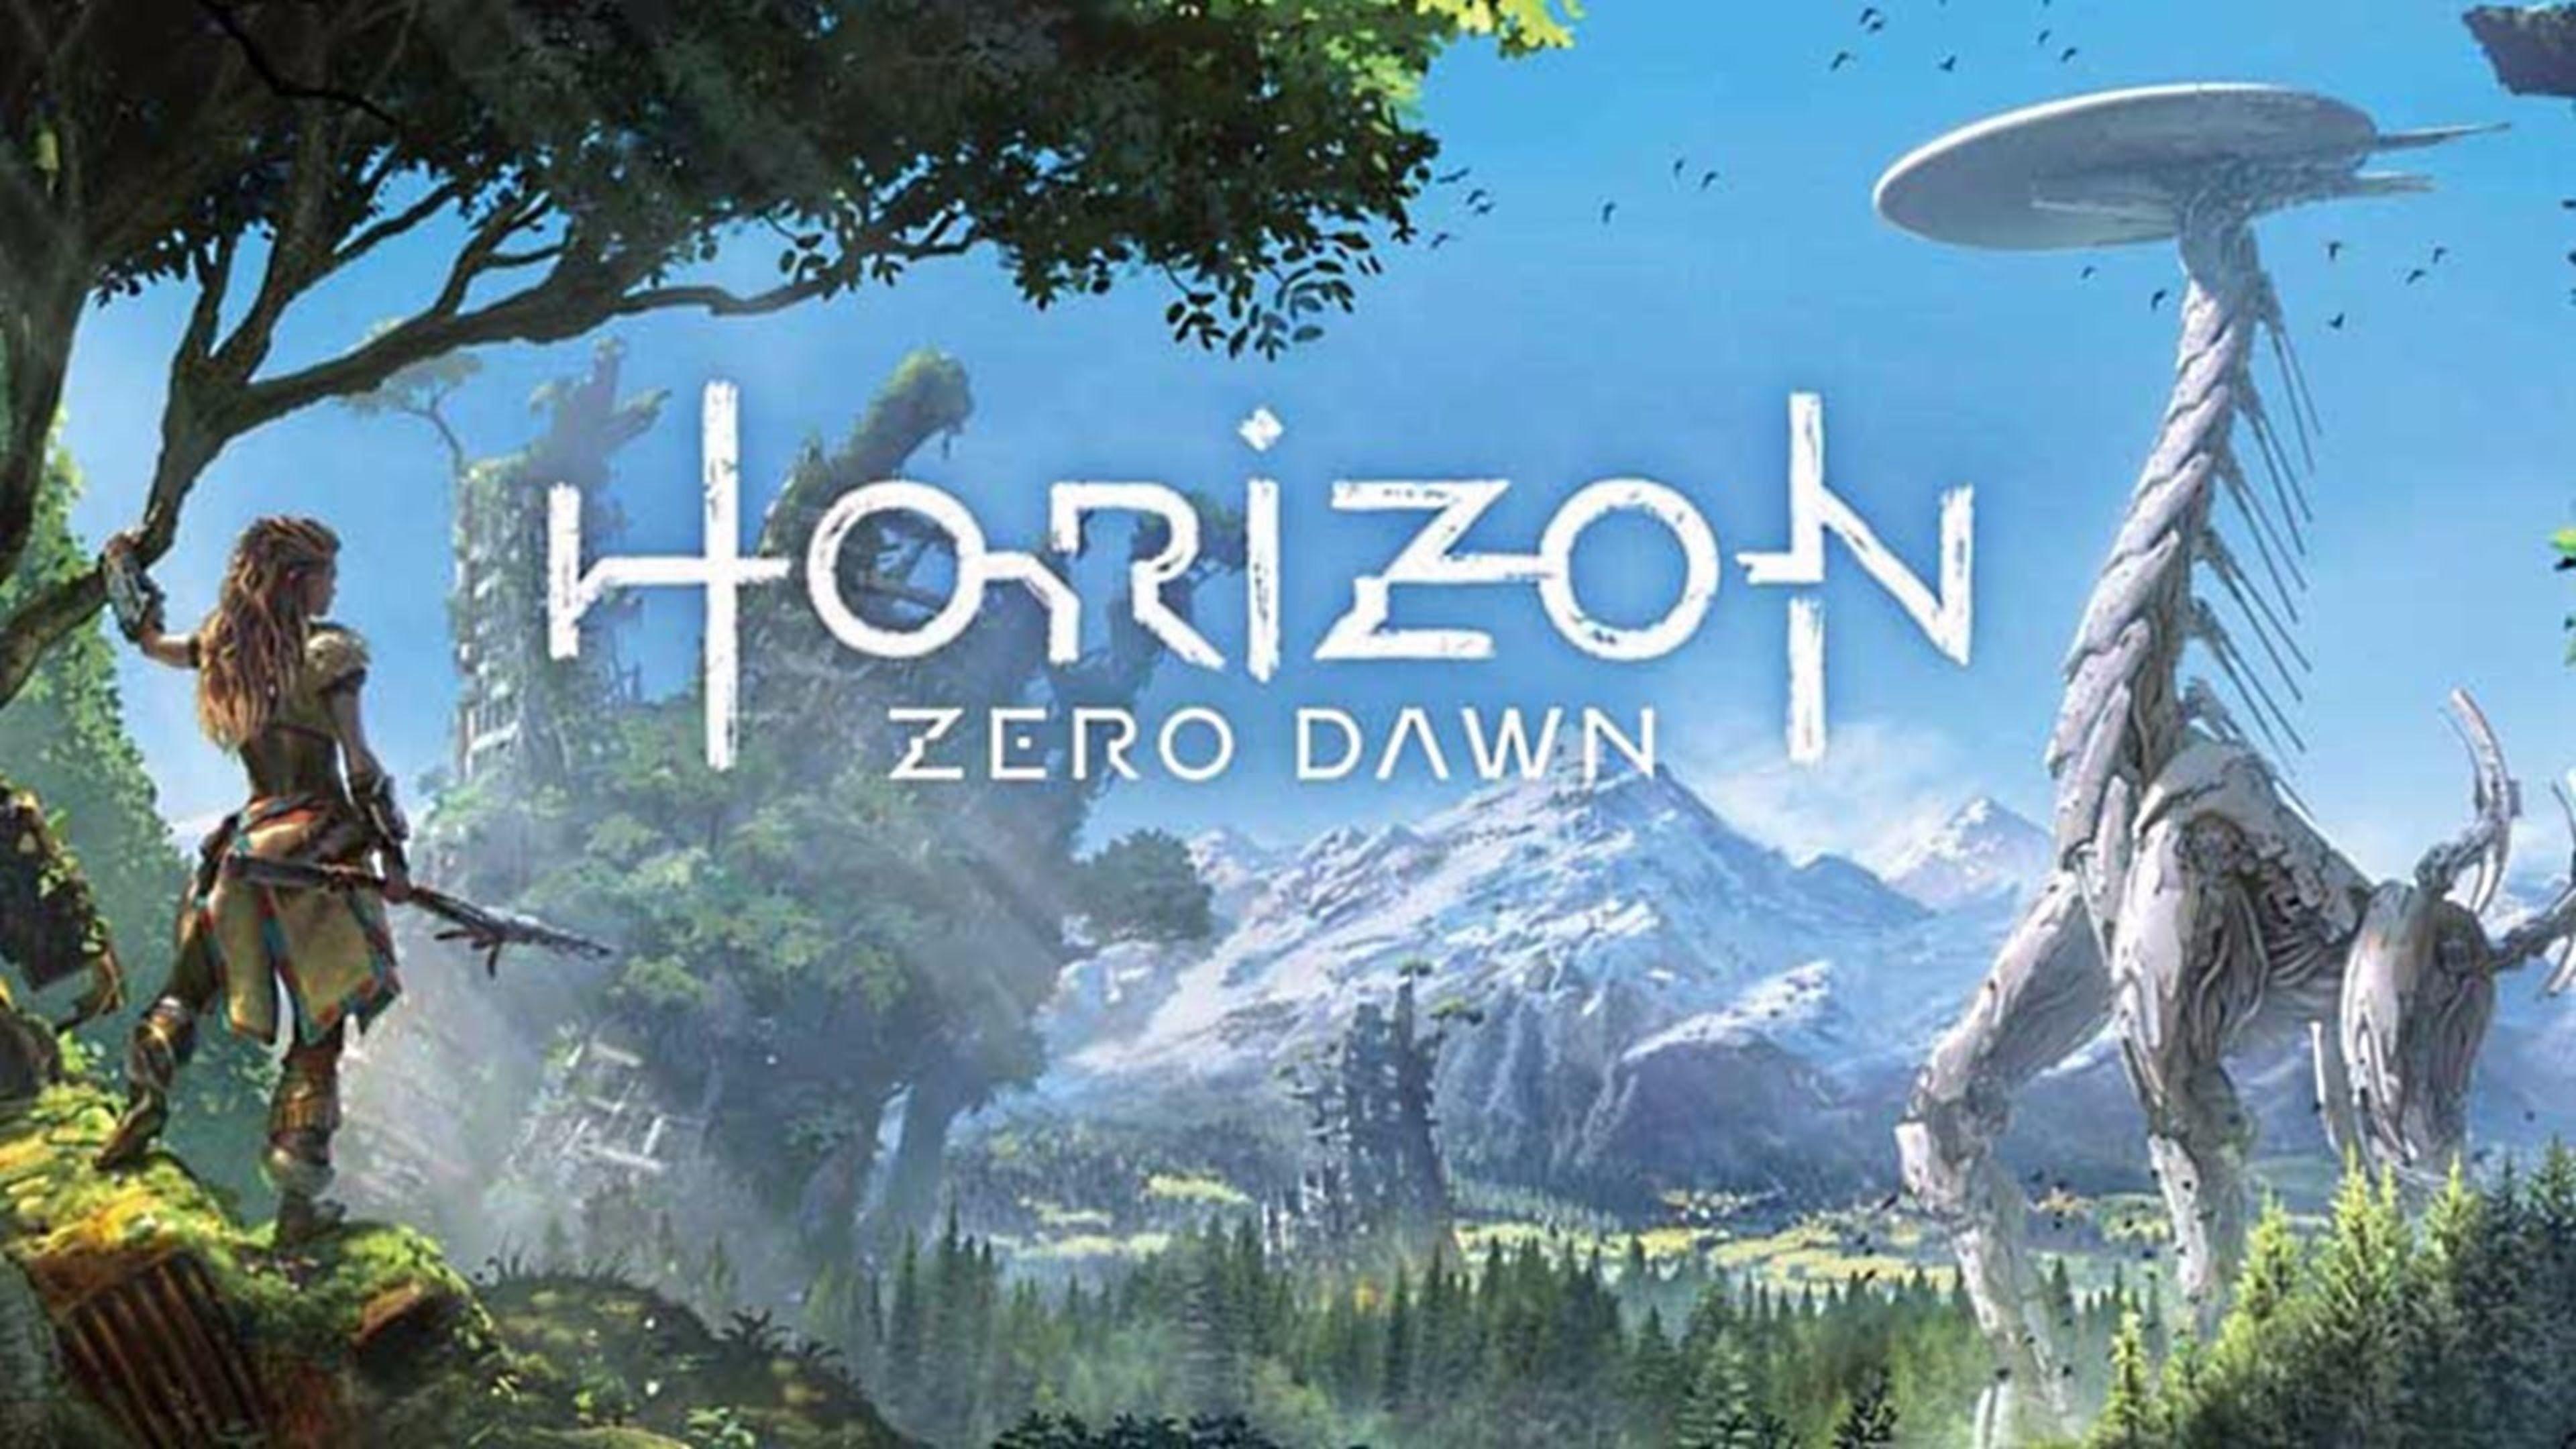 Horizon Zero Dawn Wallpapers 83 Pictures